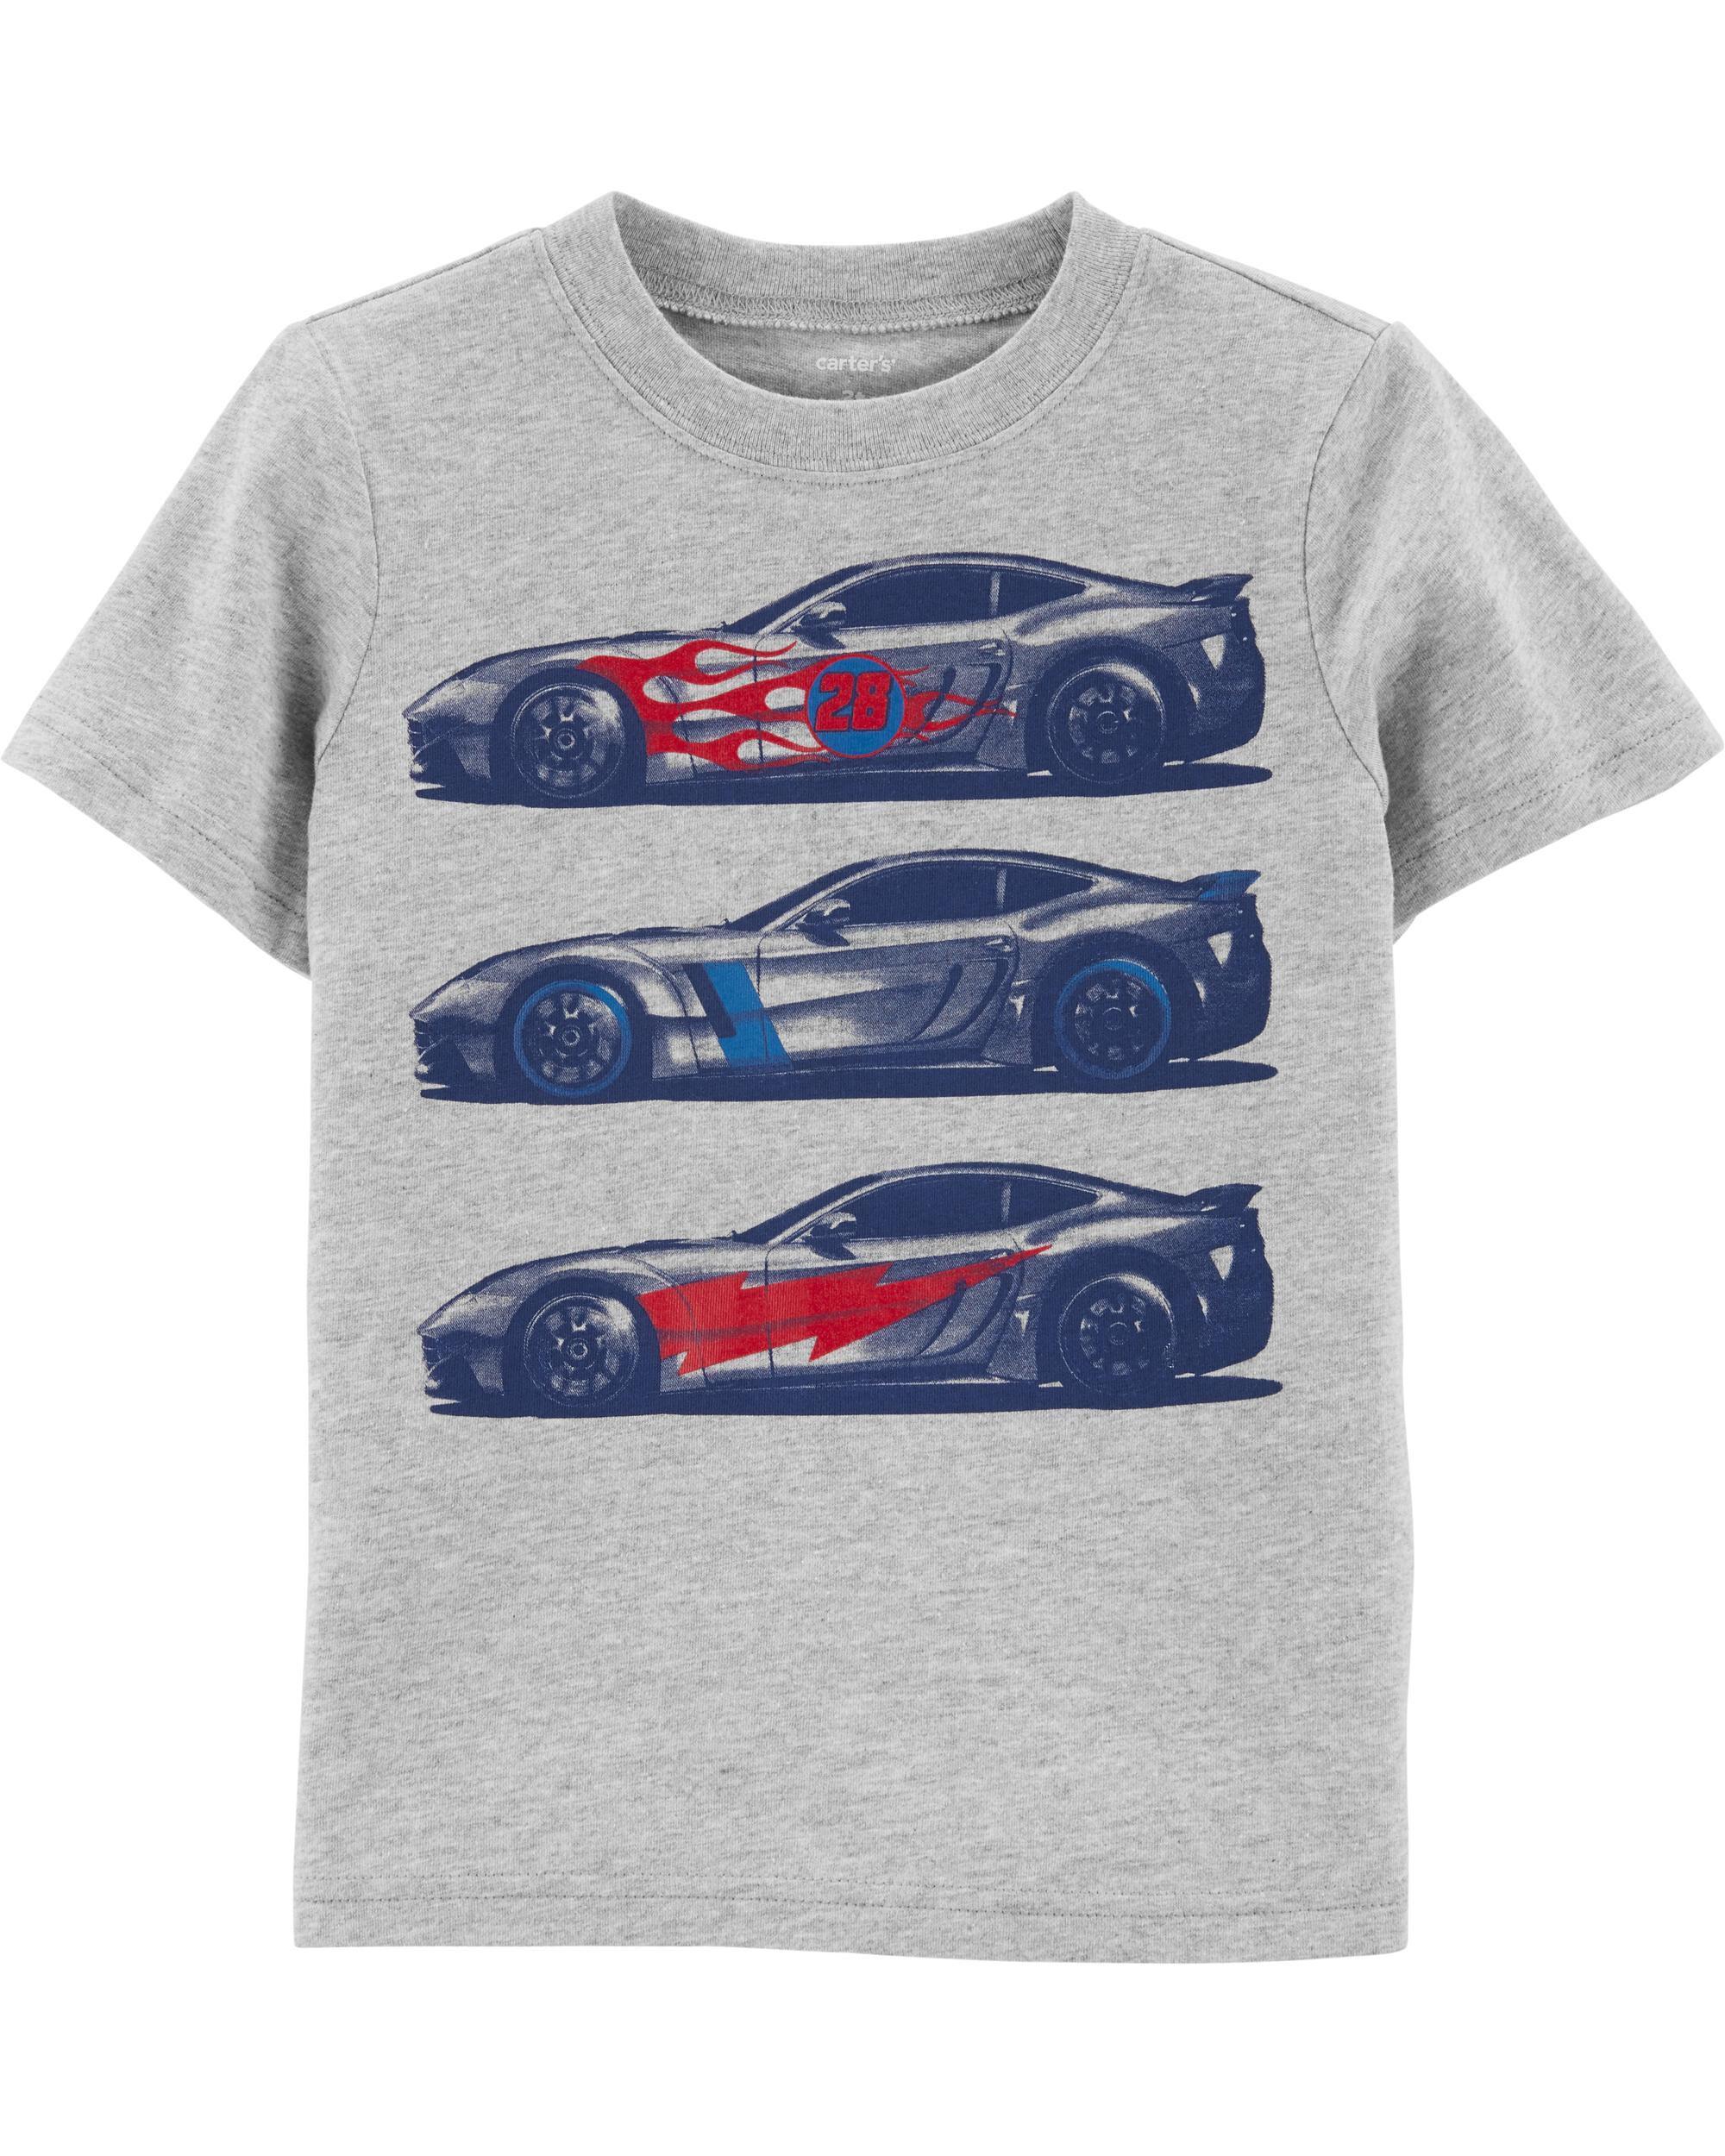 *CLEARANCE* Race Car Jersey Tee